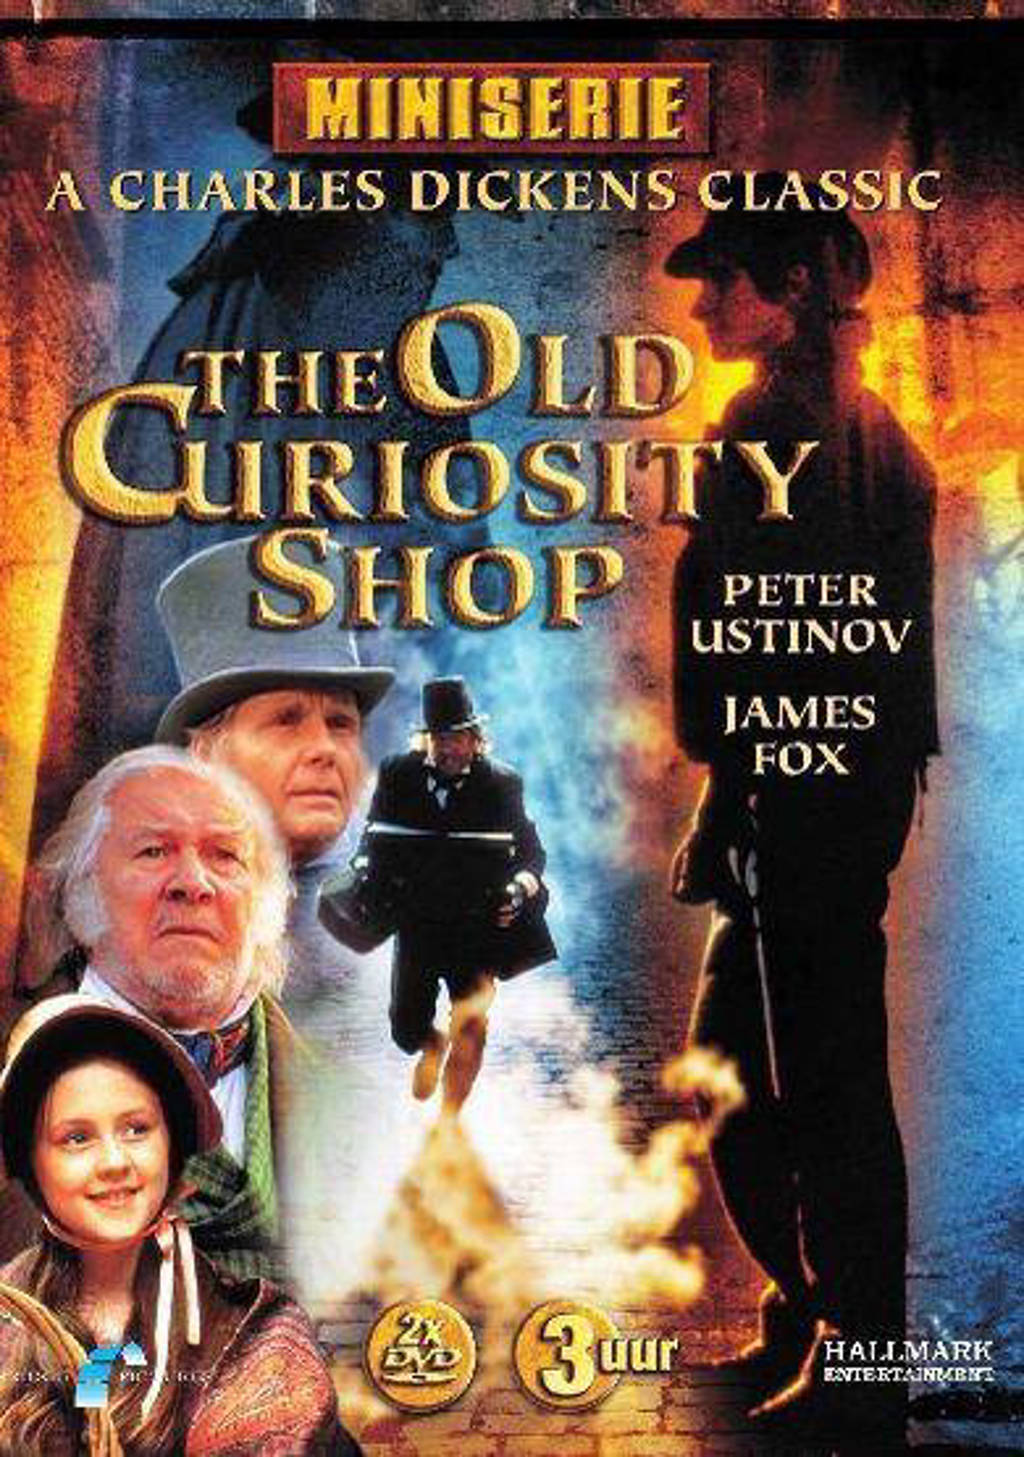 Old curiosity shop (DVD)